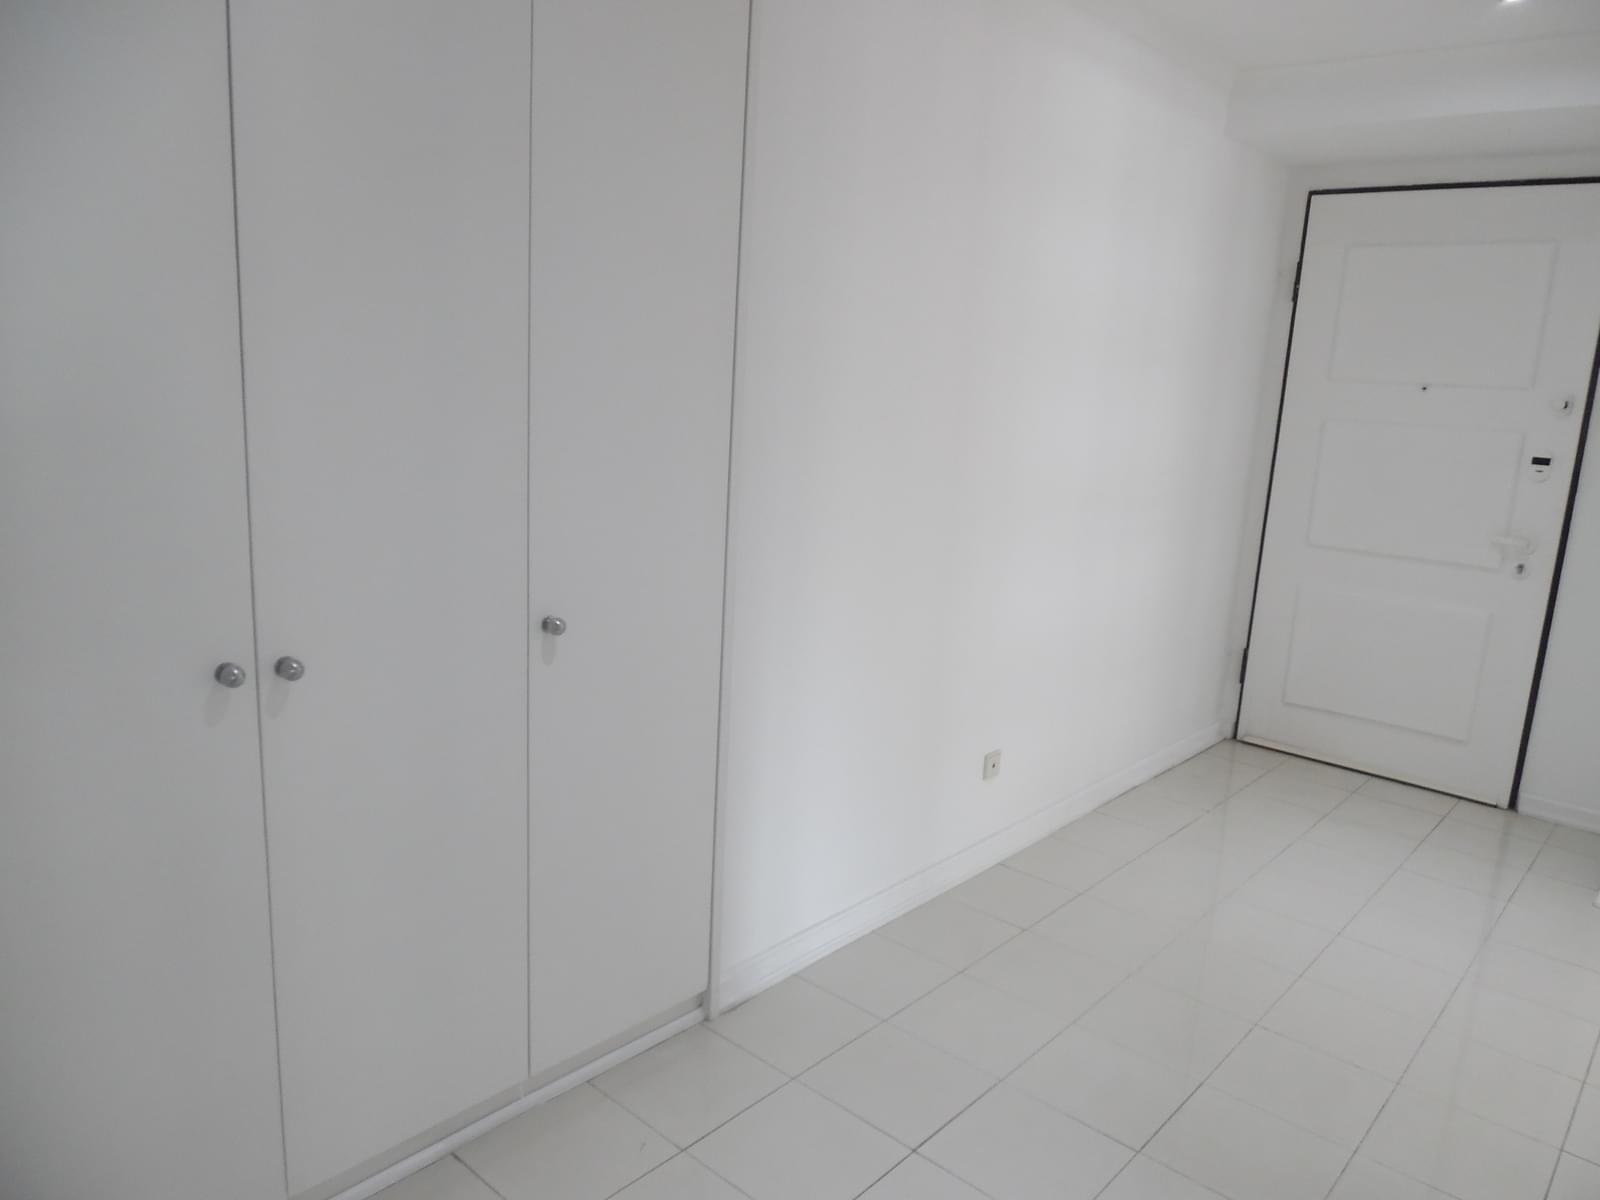 pf17637-apartamento-t2-lisboa-6f1861e1-0604-4f7c-b416-759cc8475c12